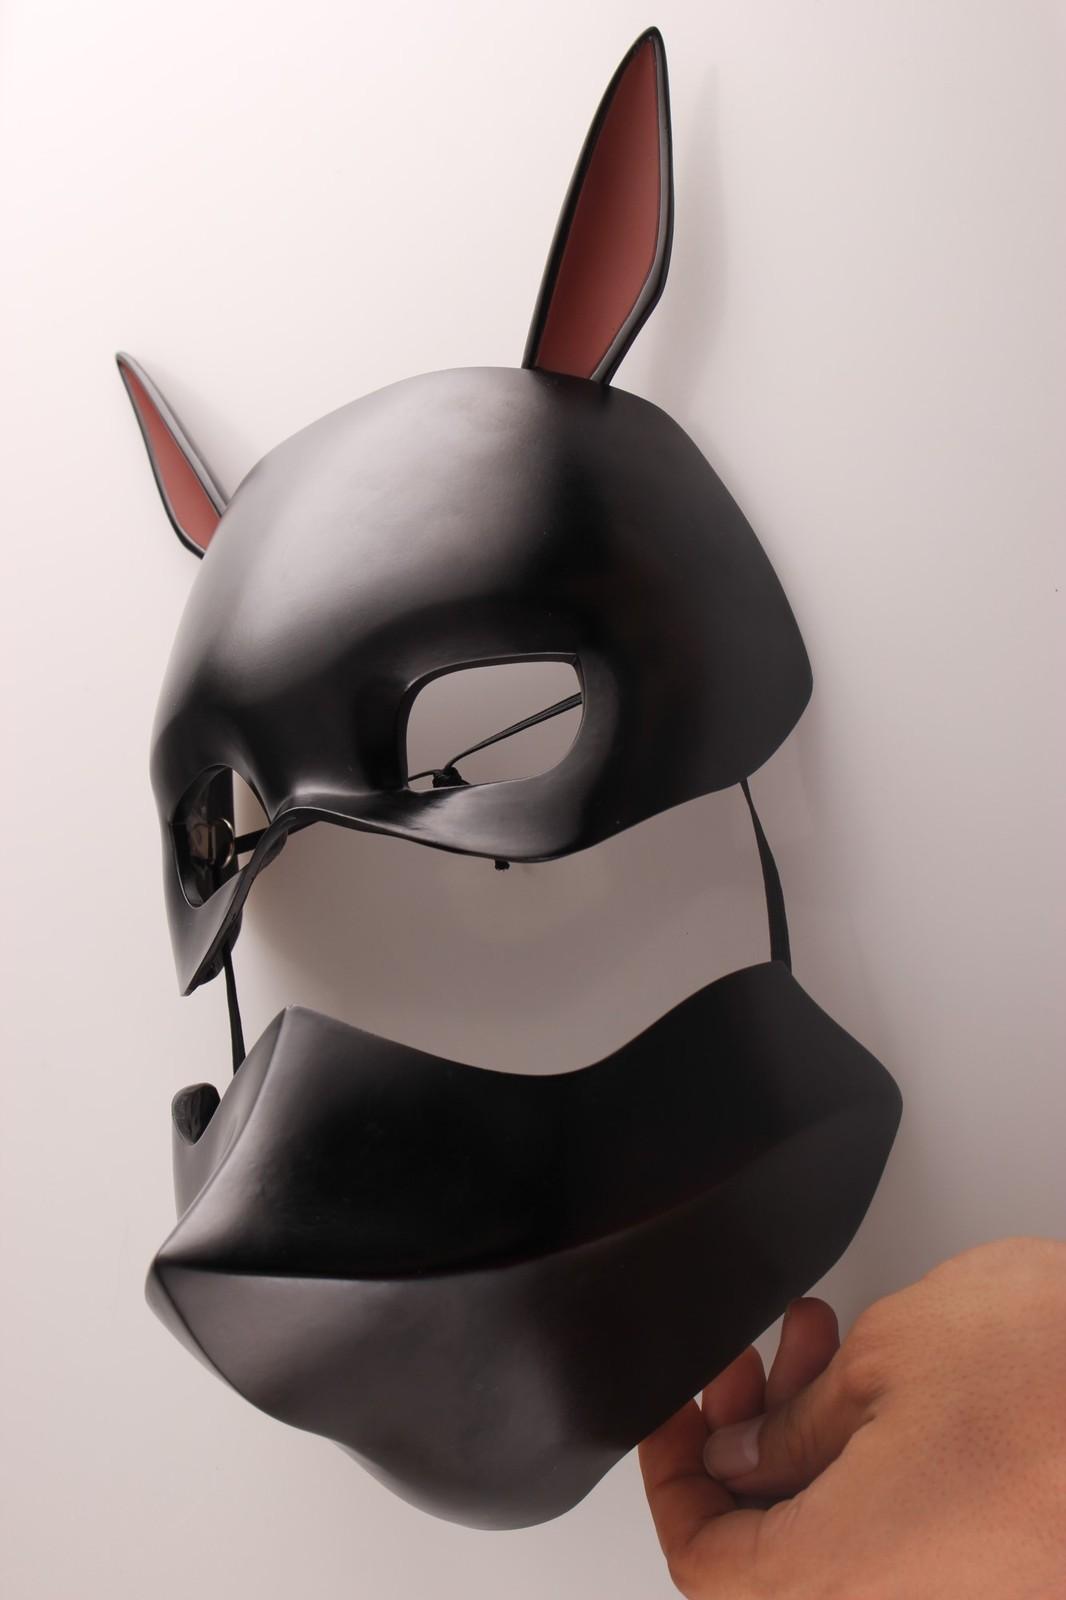 Tokyo Ghoul Re Ayato Kirishima Black Rabbit And 50 Similar Items